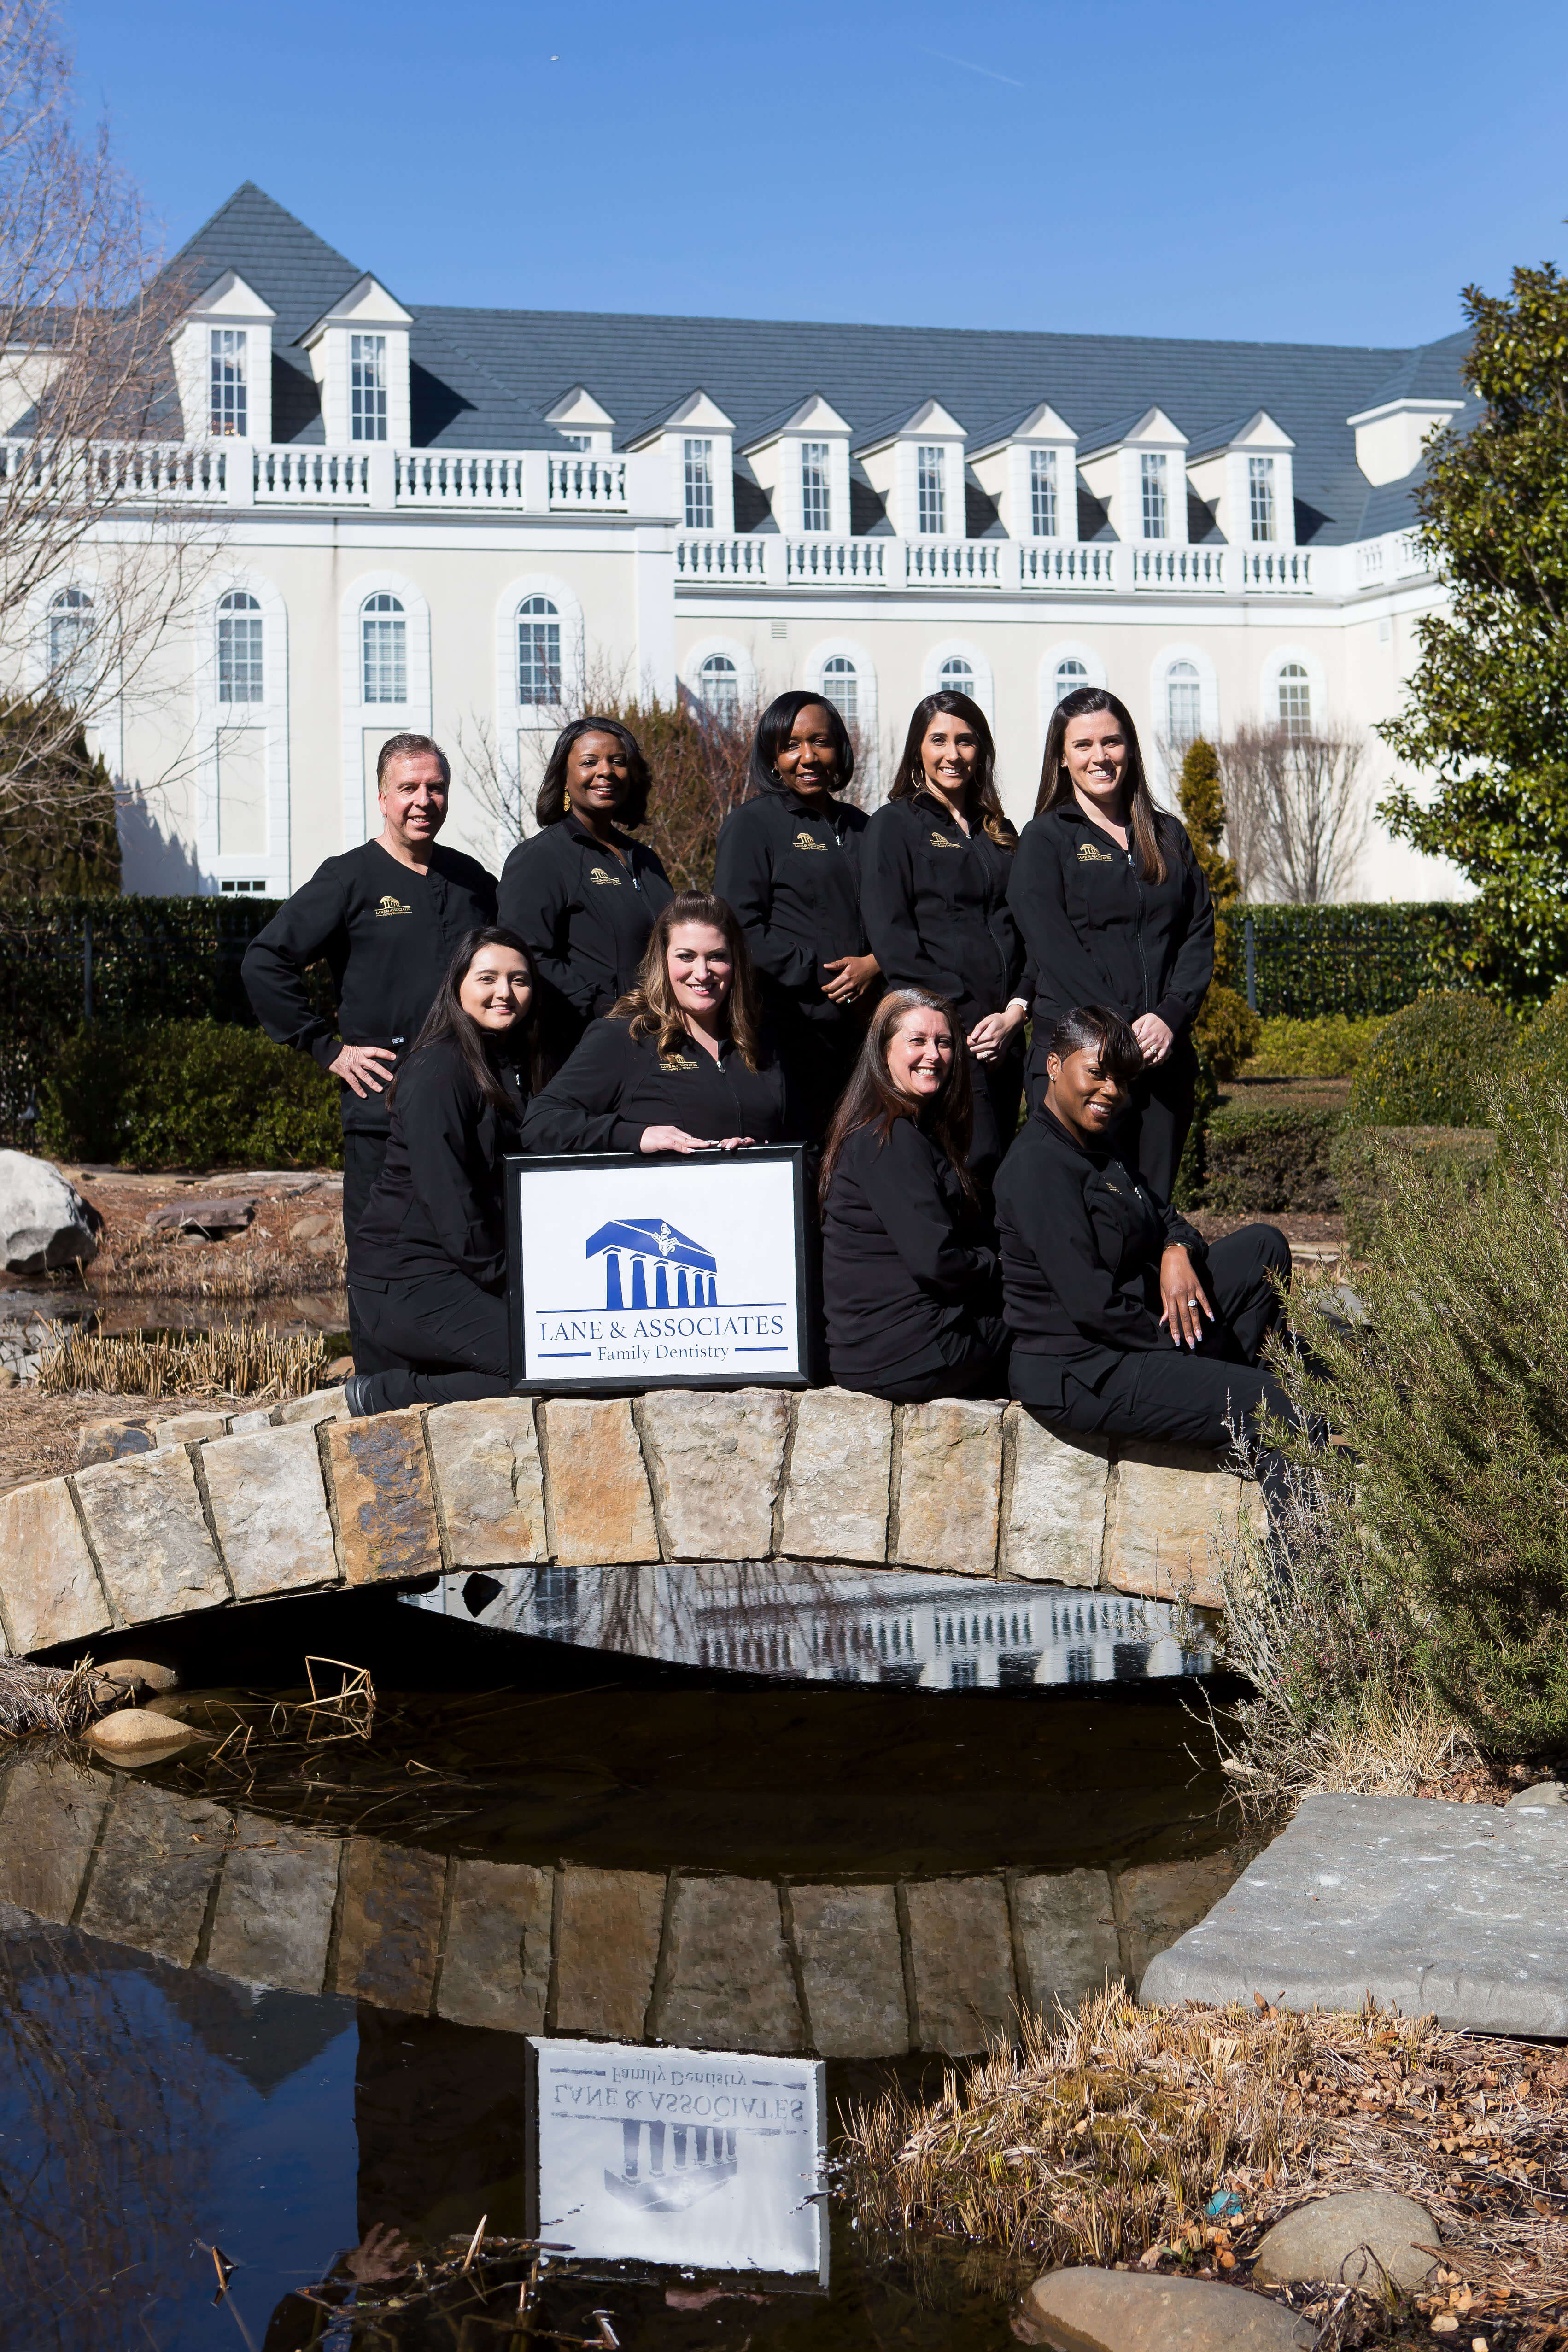 Garner NC Dentist | Lane & Associates | Cleveland Rd Dental Office 40/42